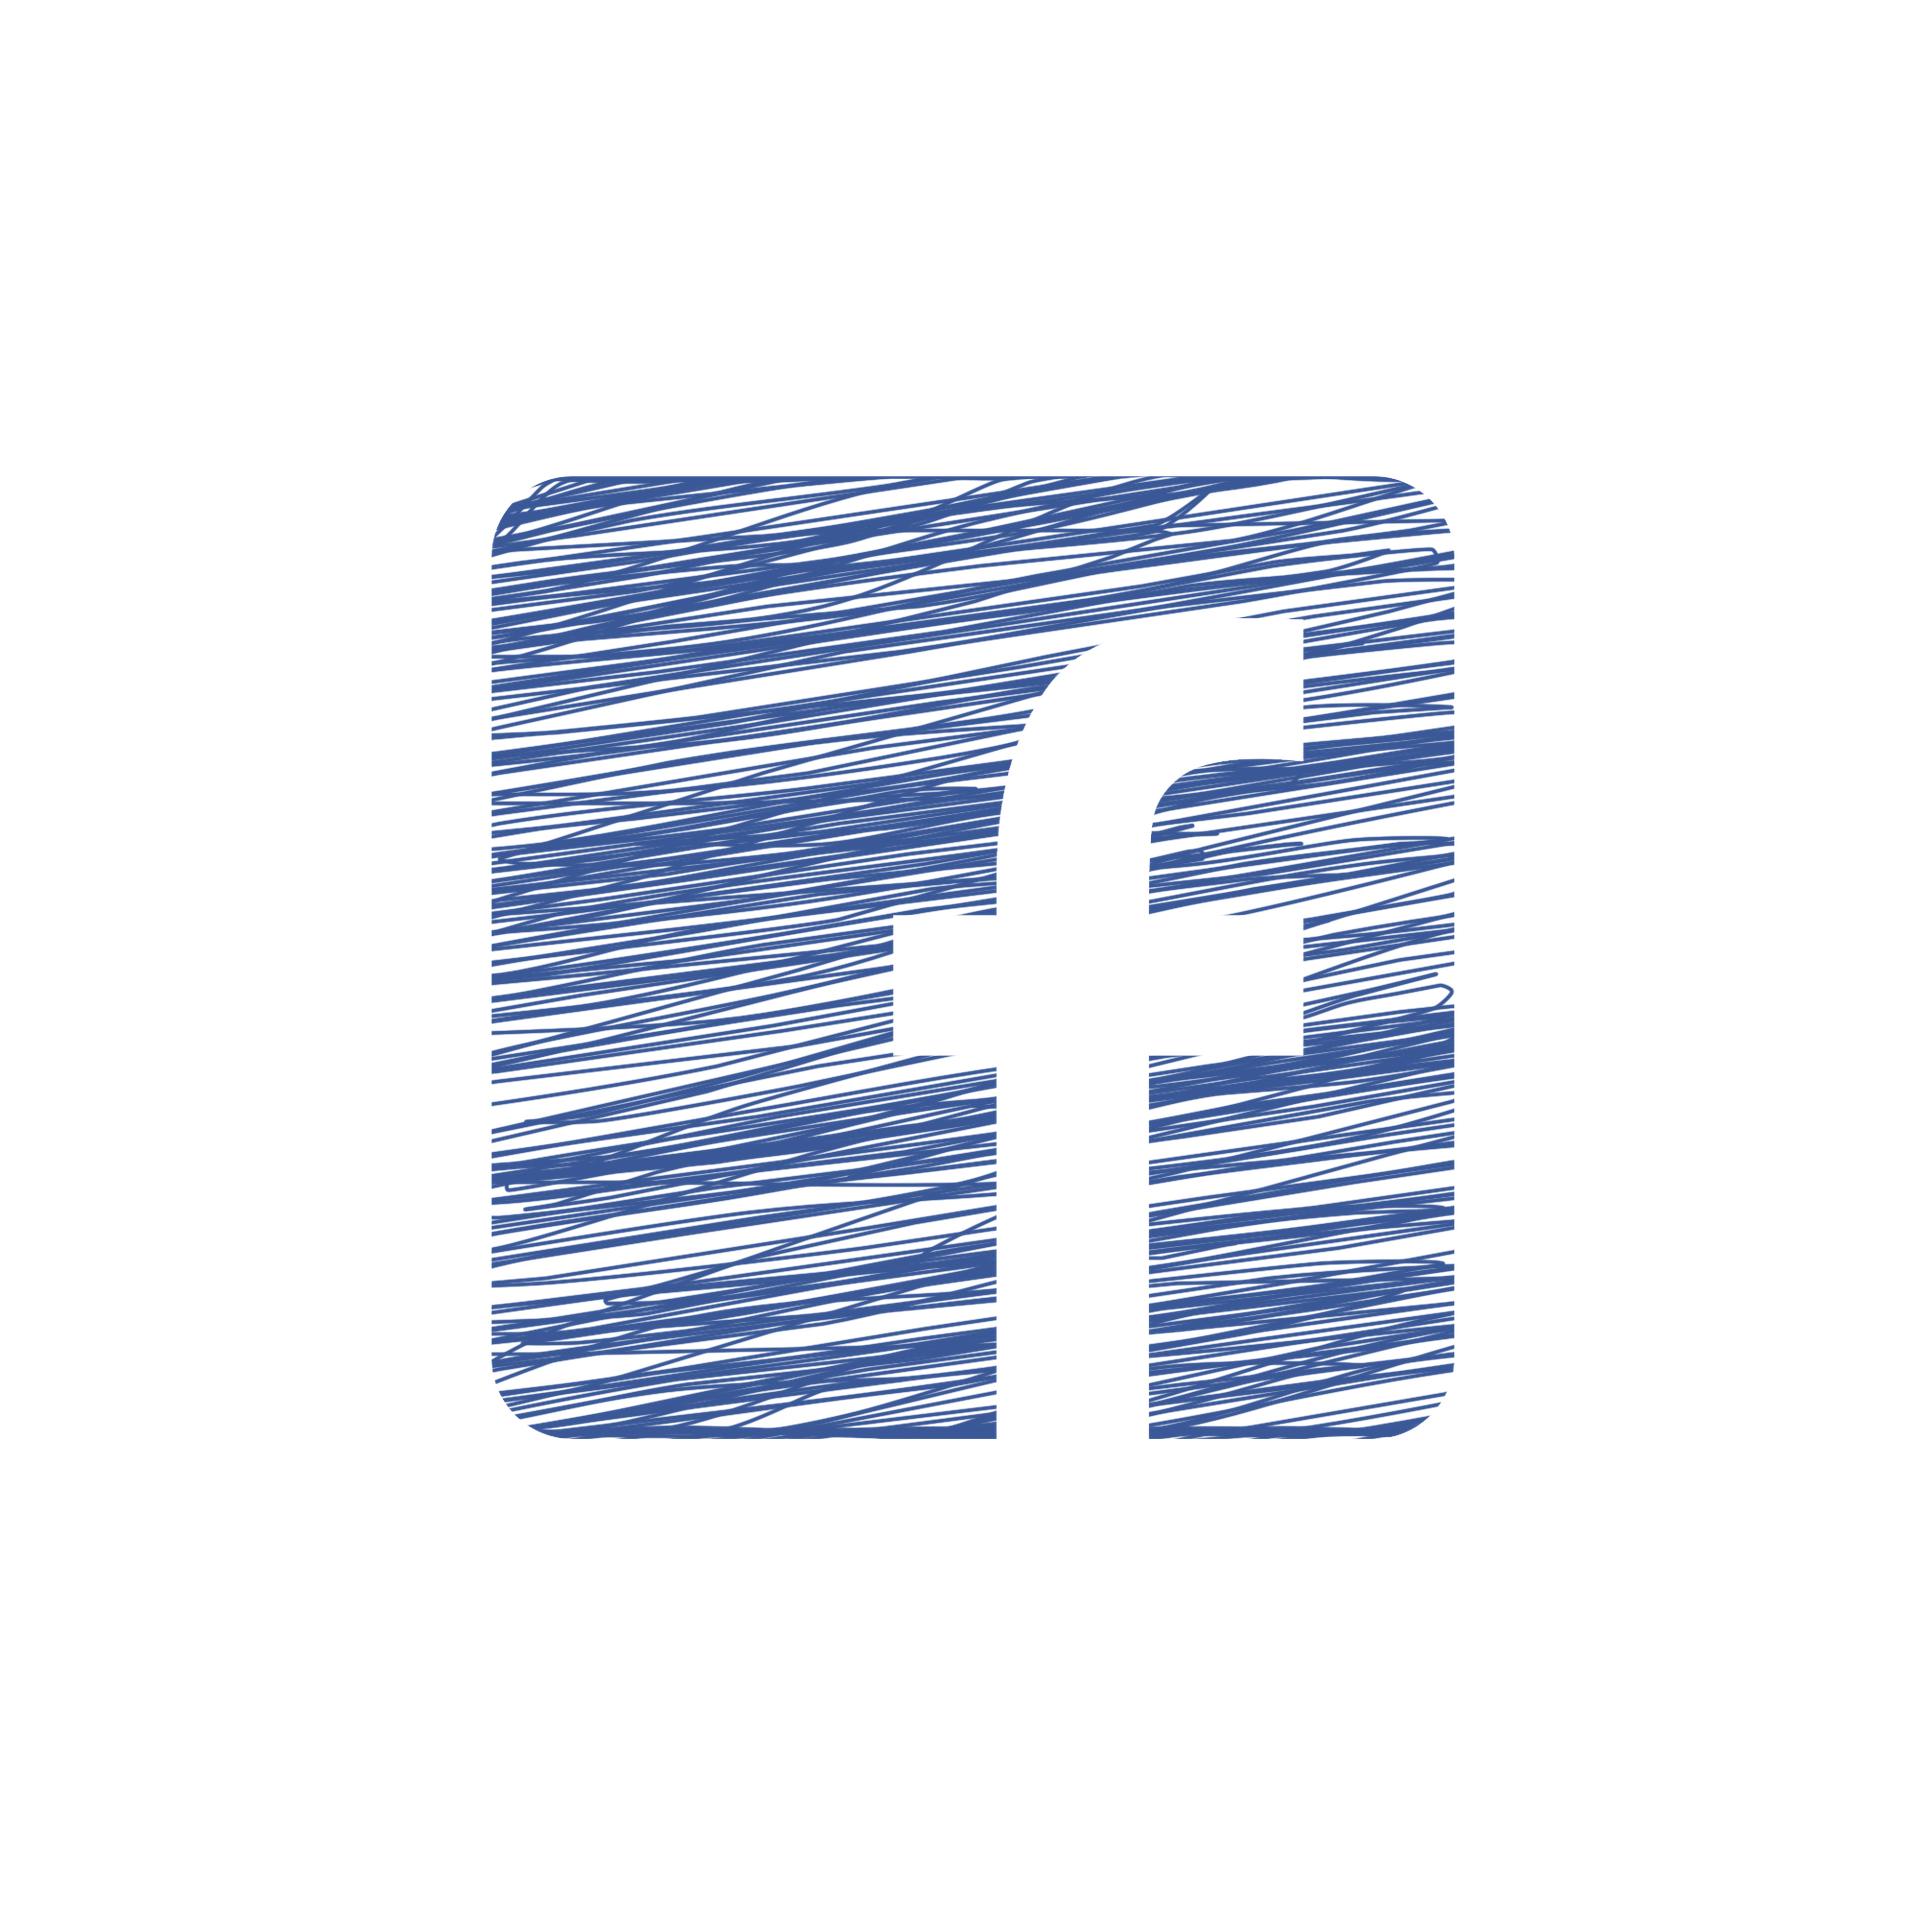 Nu ook op Facebook